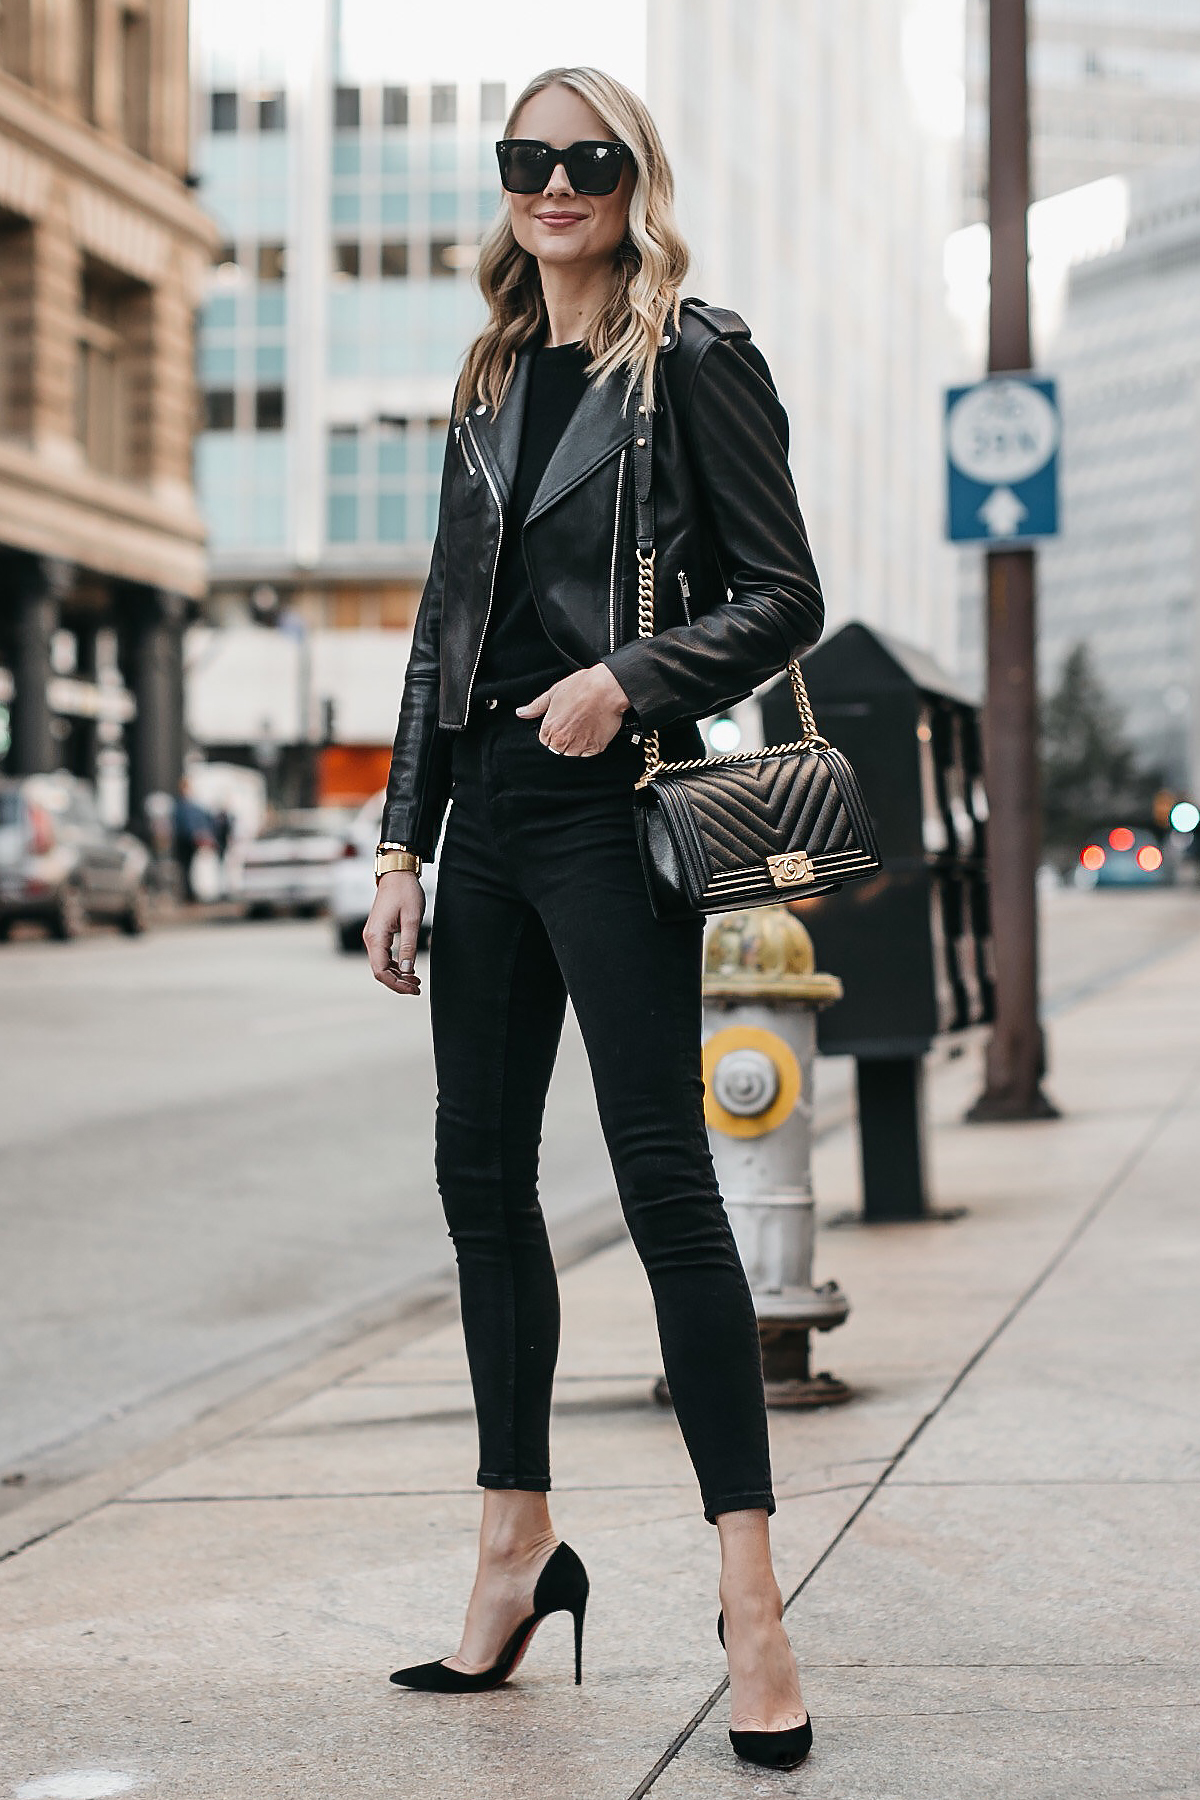 Fashion-Jackson-Club-Monaco-Black-Leather-Jacket-Black-Sweater-Black-Skinny-Jeans-Black-Pumps-Chanel-Boy-Bag-1